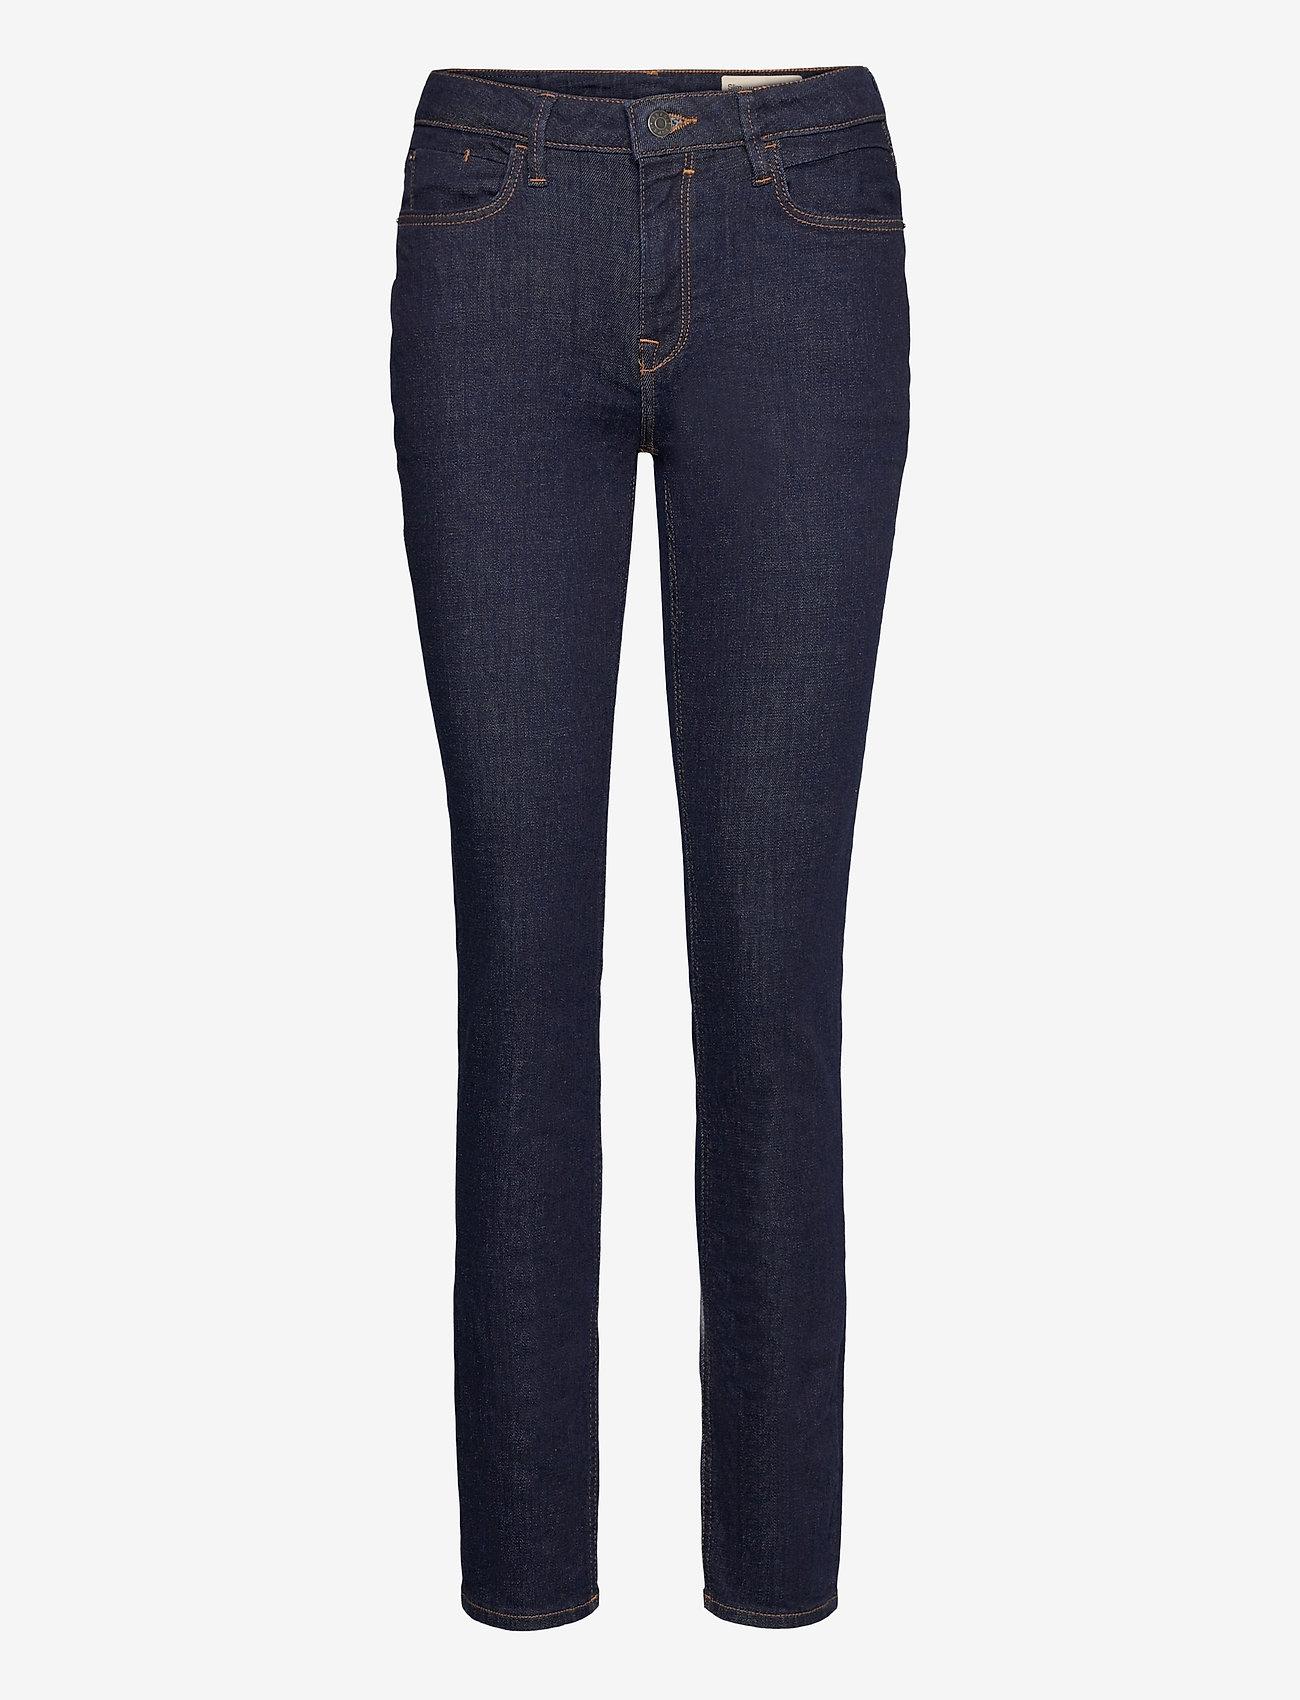 Esprit Casual - Pants denim - slim jeans - blue rinse - 0